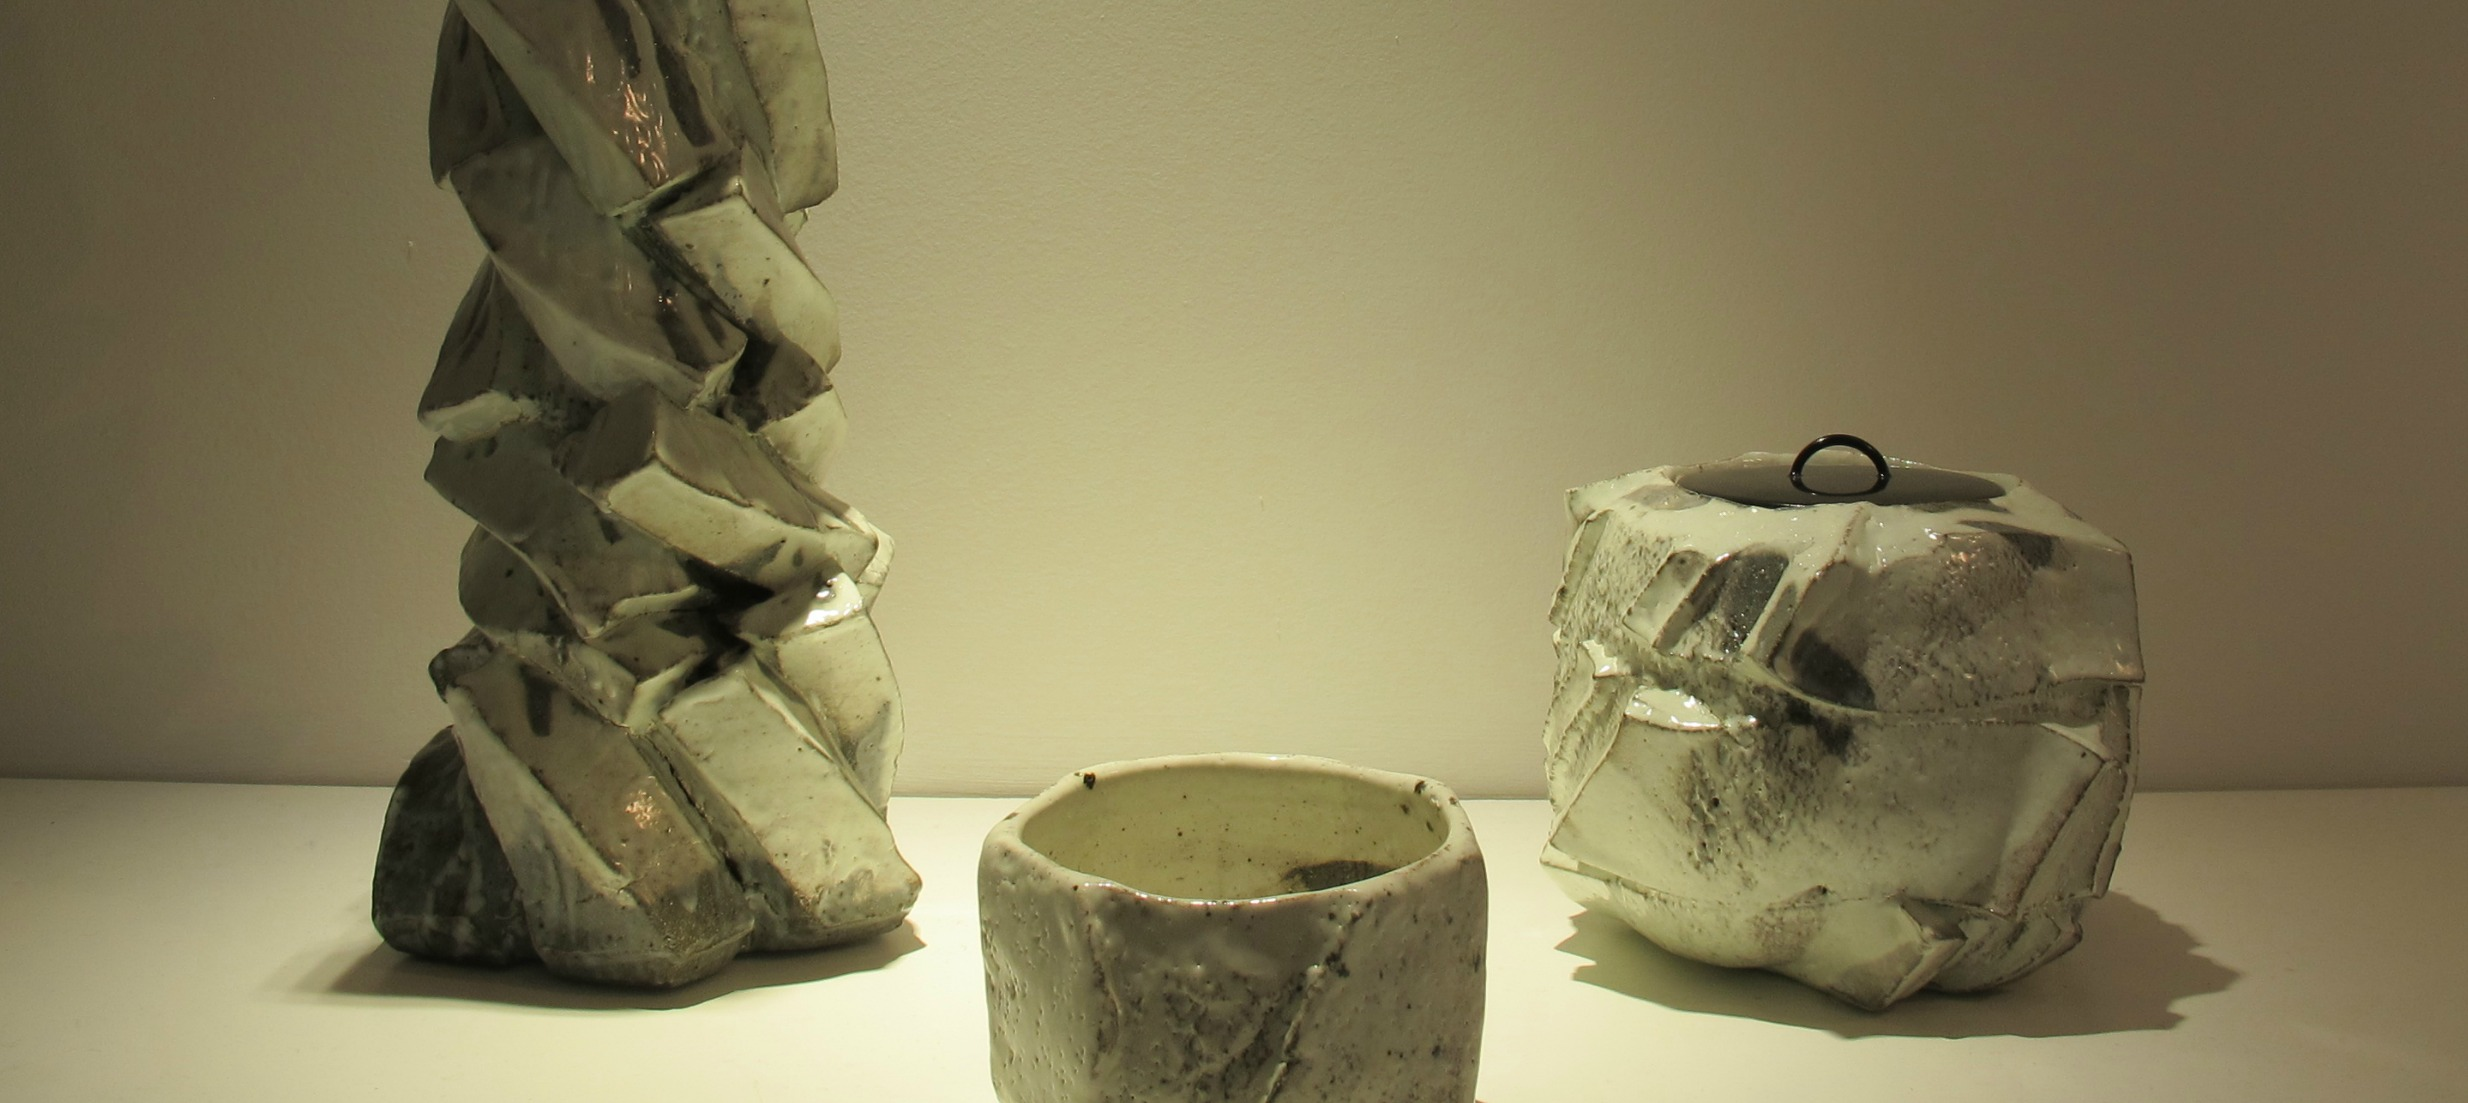 Ceramics by Shozo Michikawa, detail. Photo by Cristina Solano.